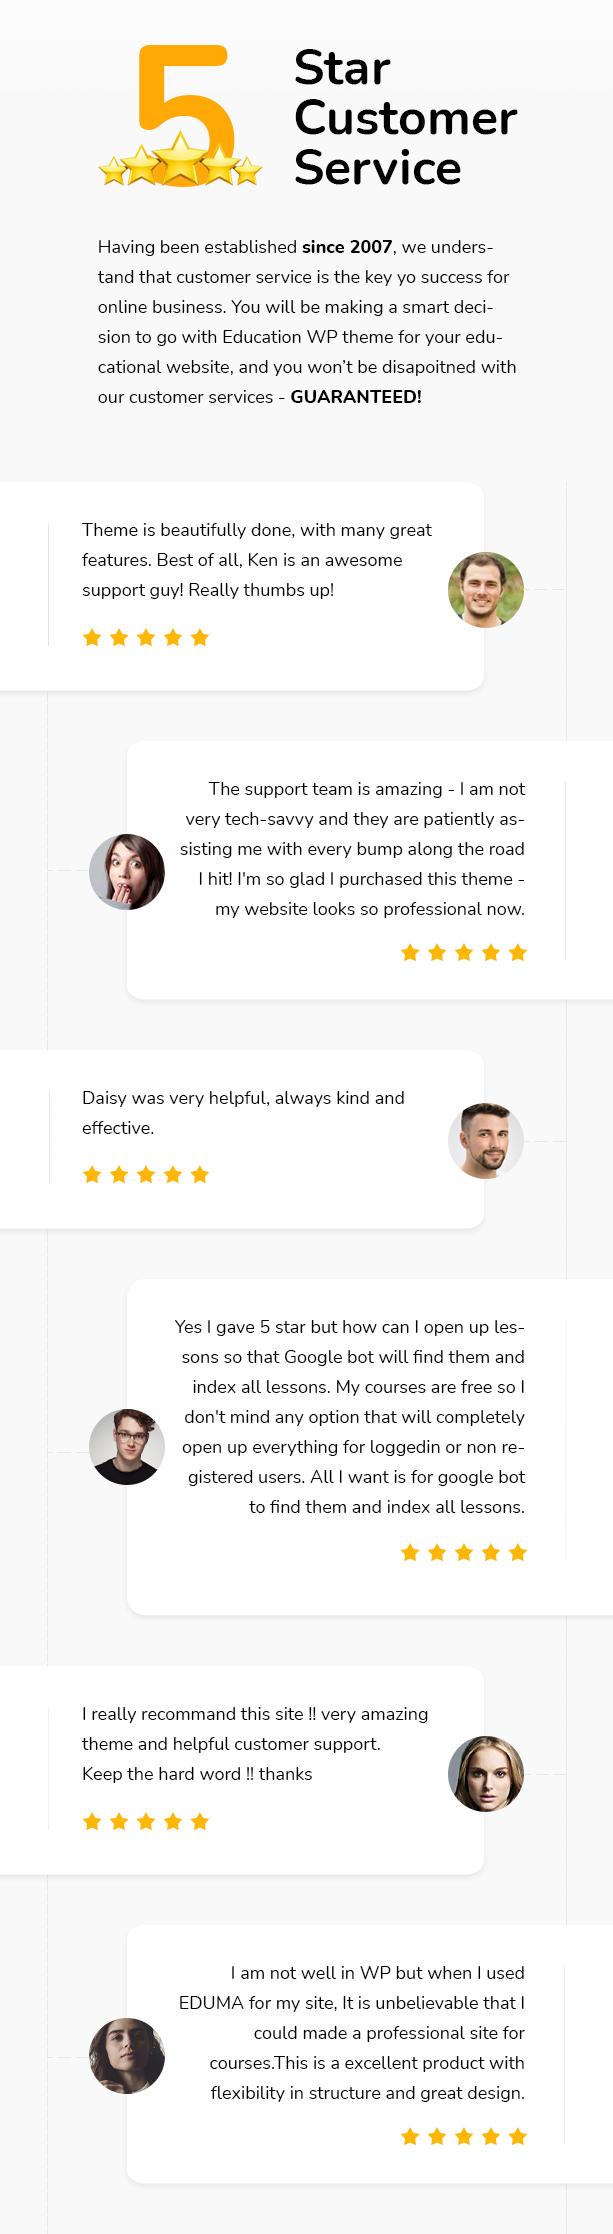 Education WordPress theme - 5 stars customers review